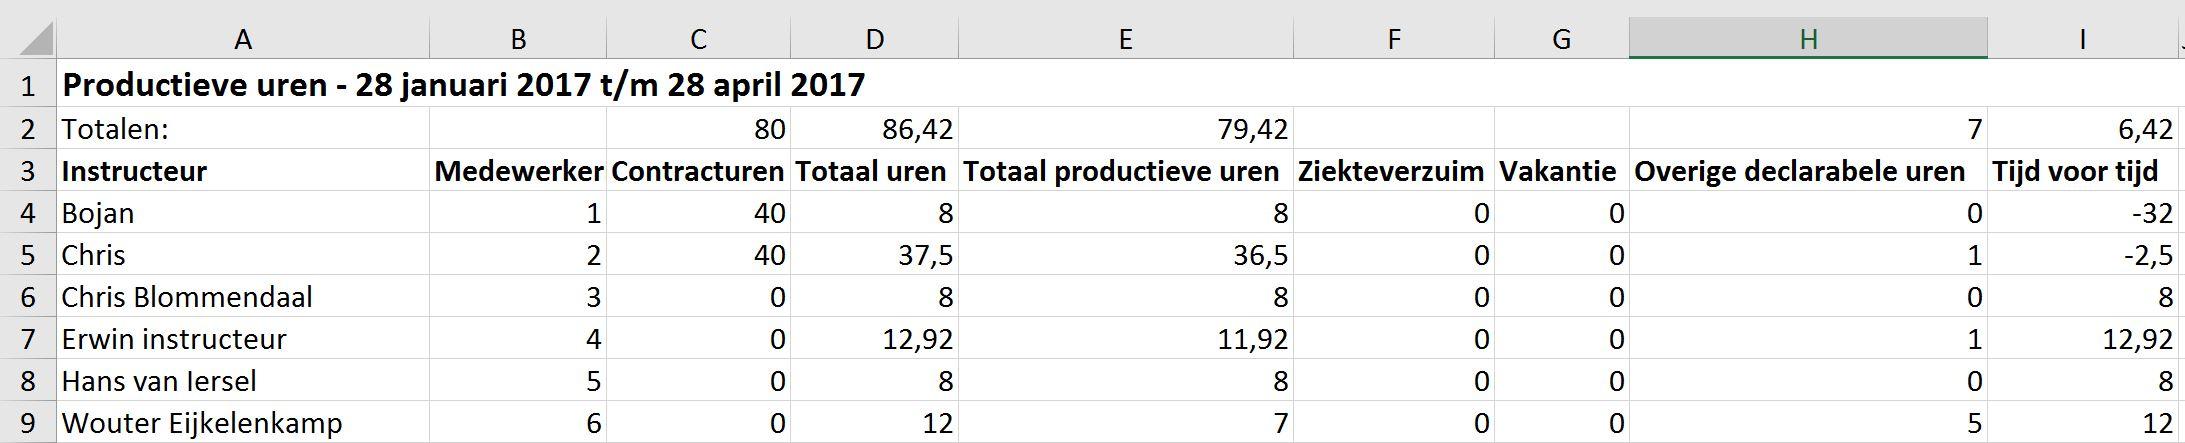 Inhoud_urenrapport_Dation.JPG